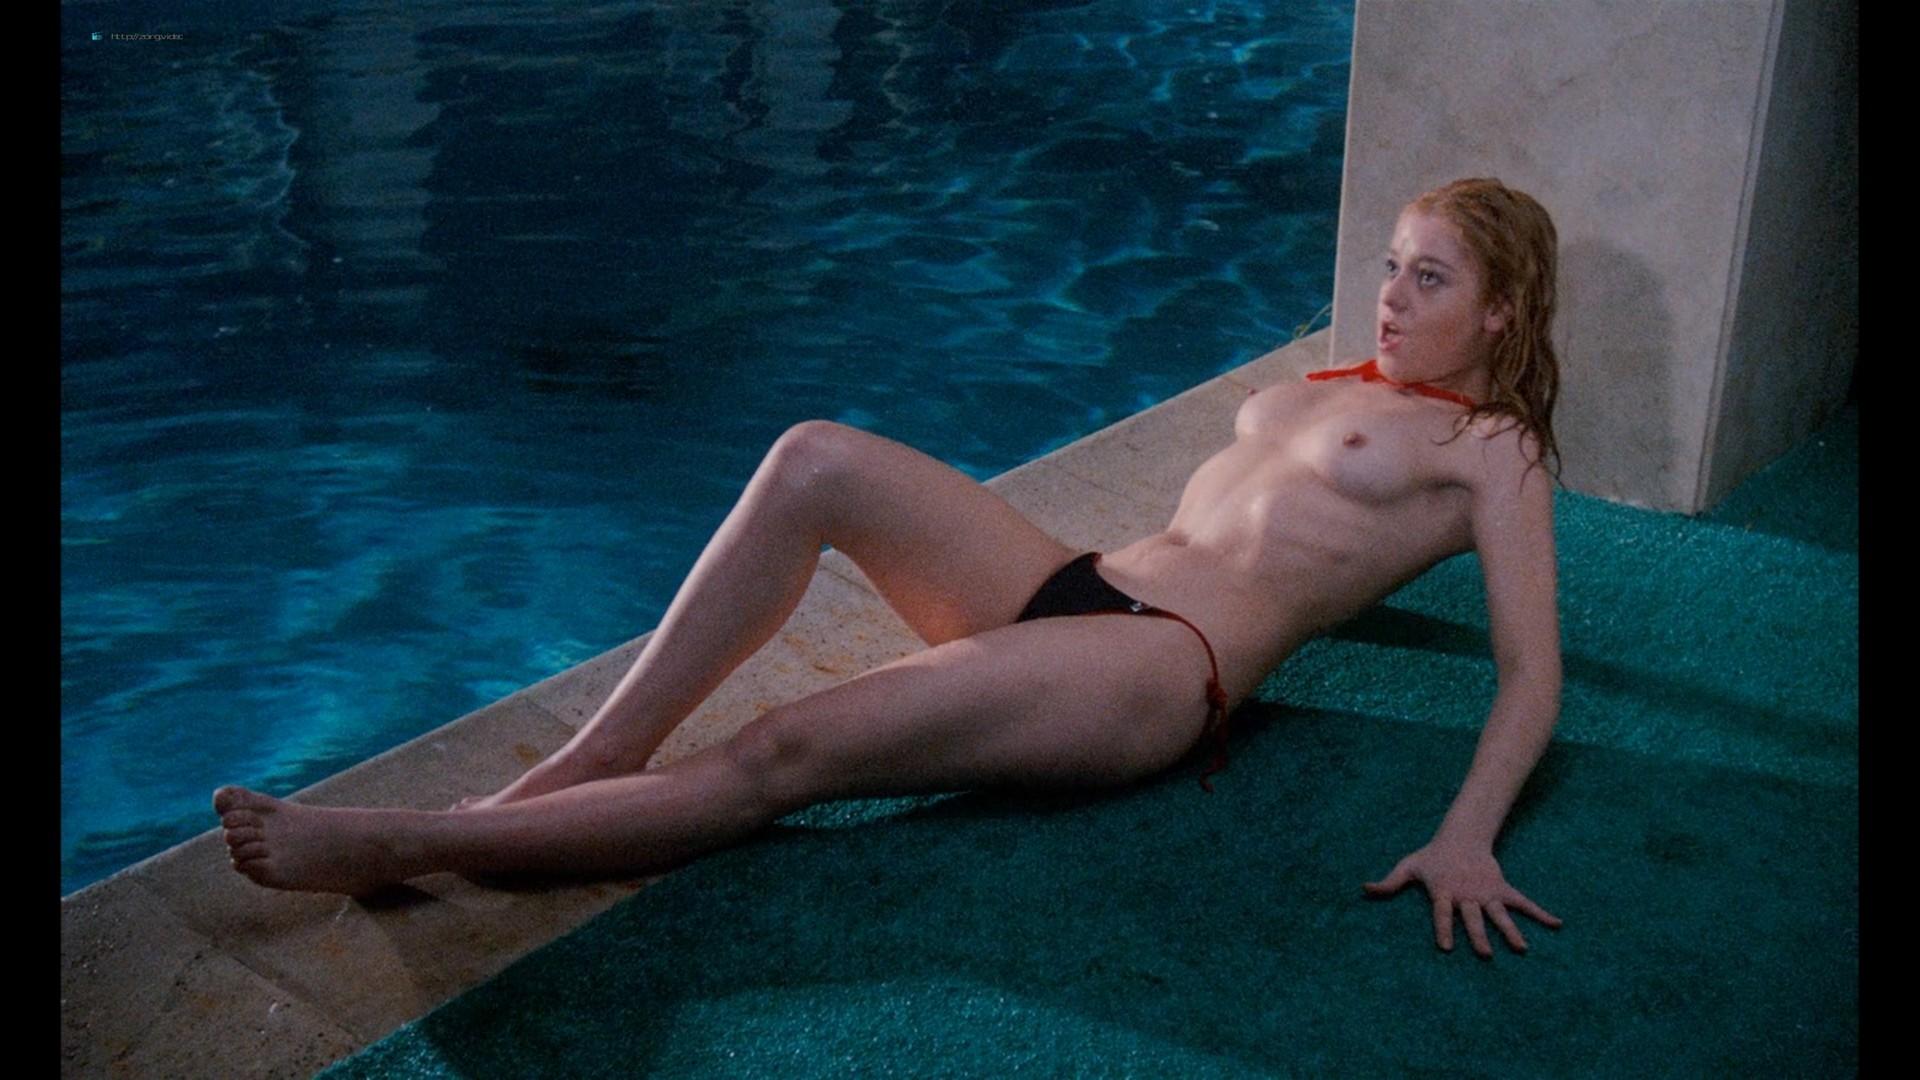 Roxana Nieto nude Leticia Marfil and Pilar Alcón all nude bush topless - Pieces (1982) HD 1080p BluRay (14)